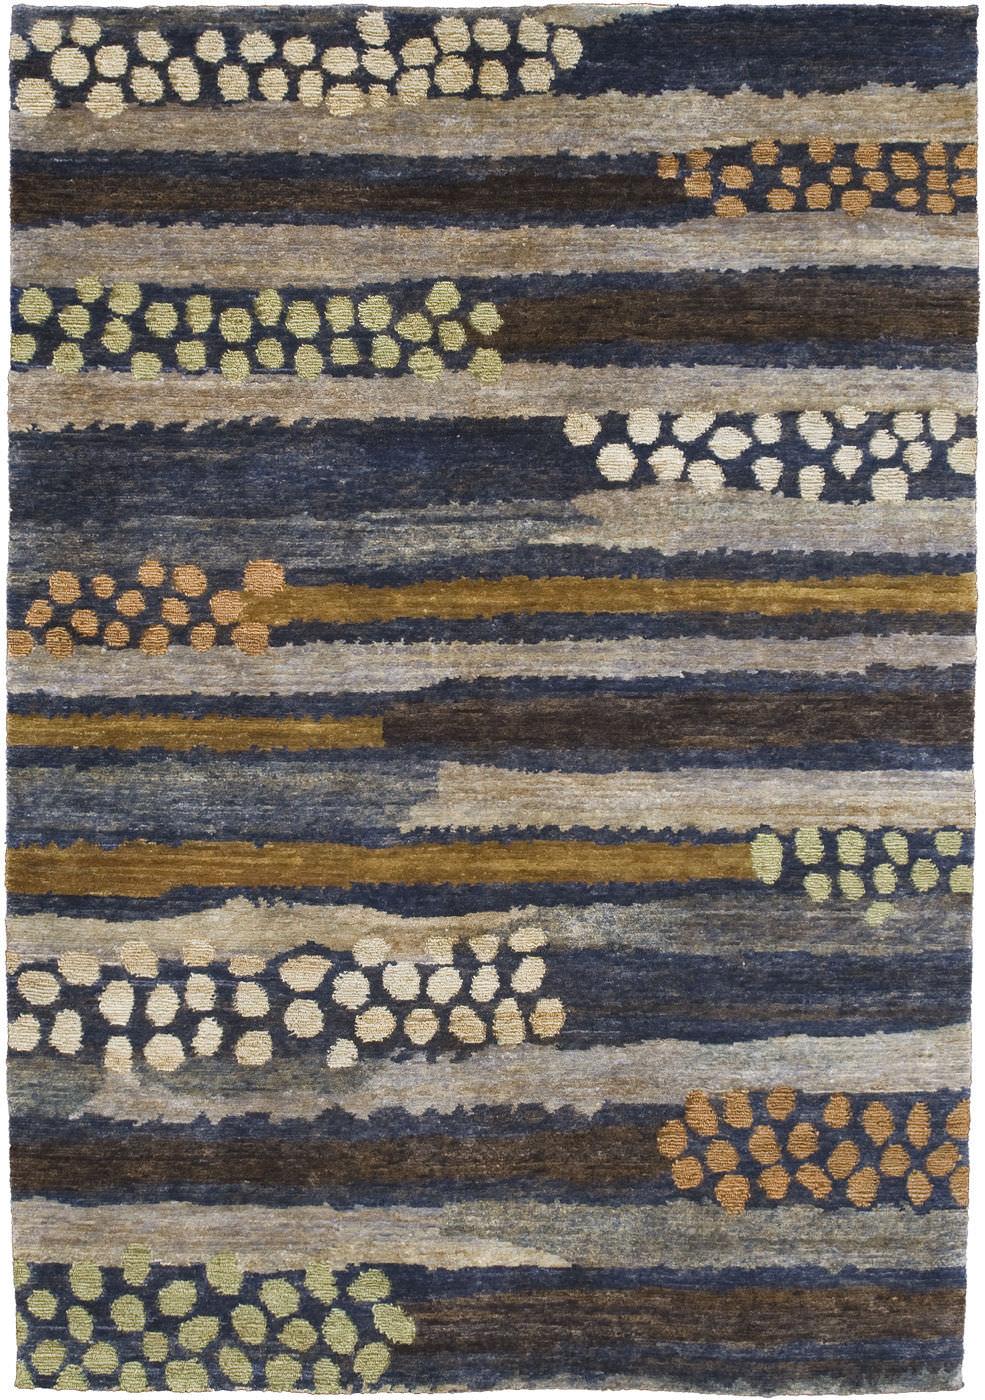 Contemporary Rug Patterned Jute Rectangular Pebbledash By Kit Kemp